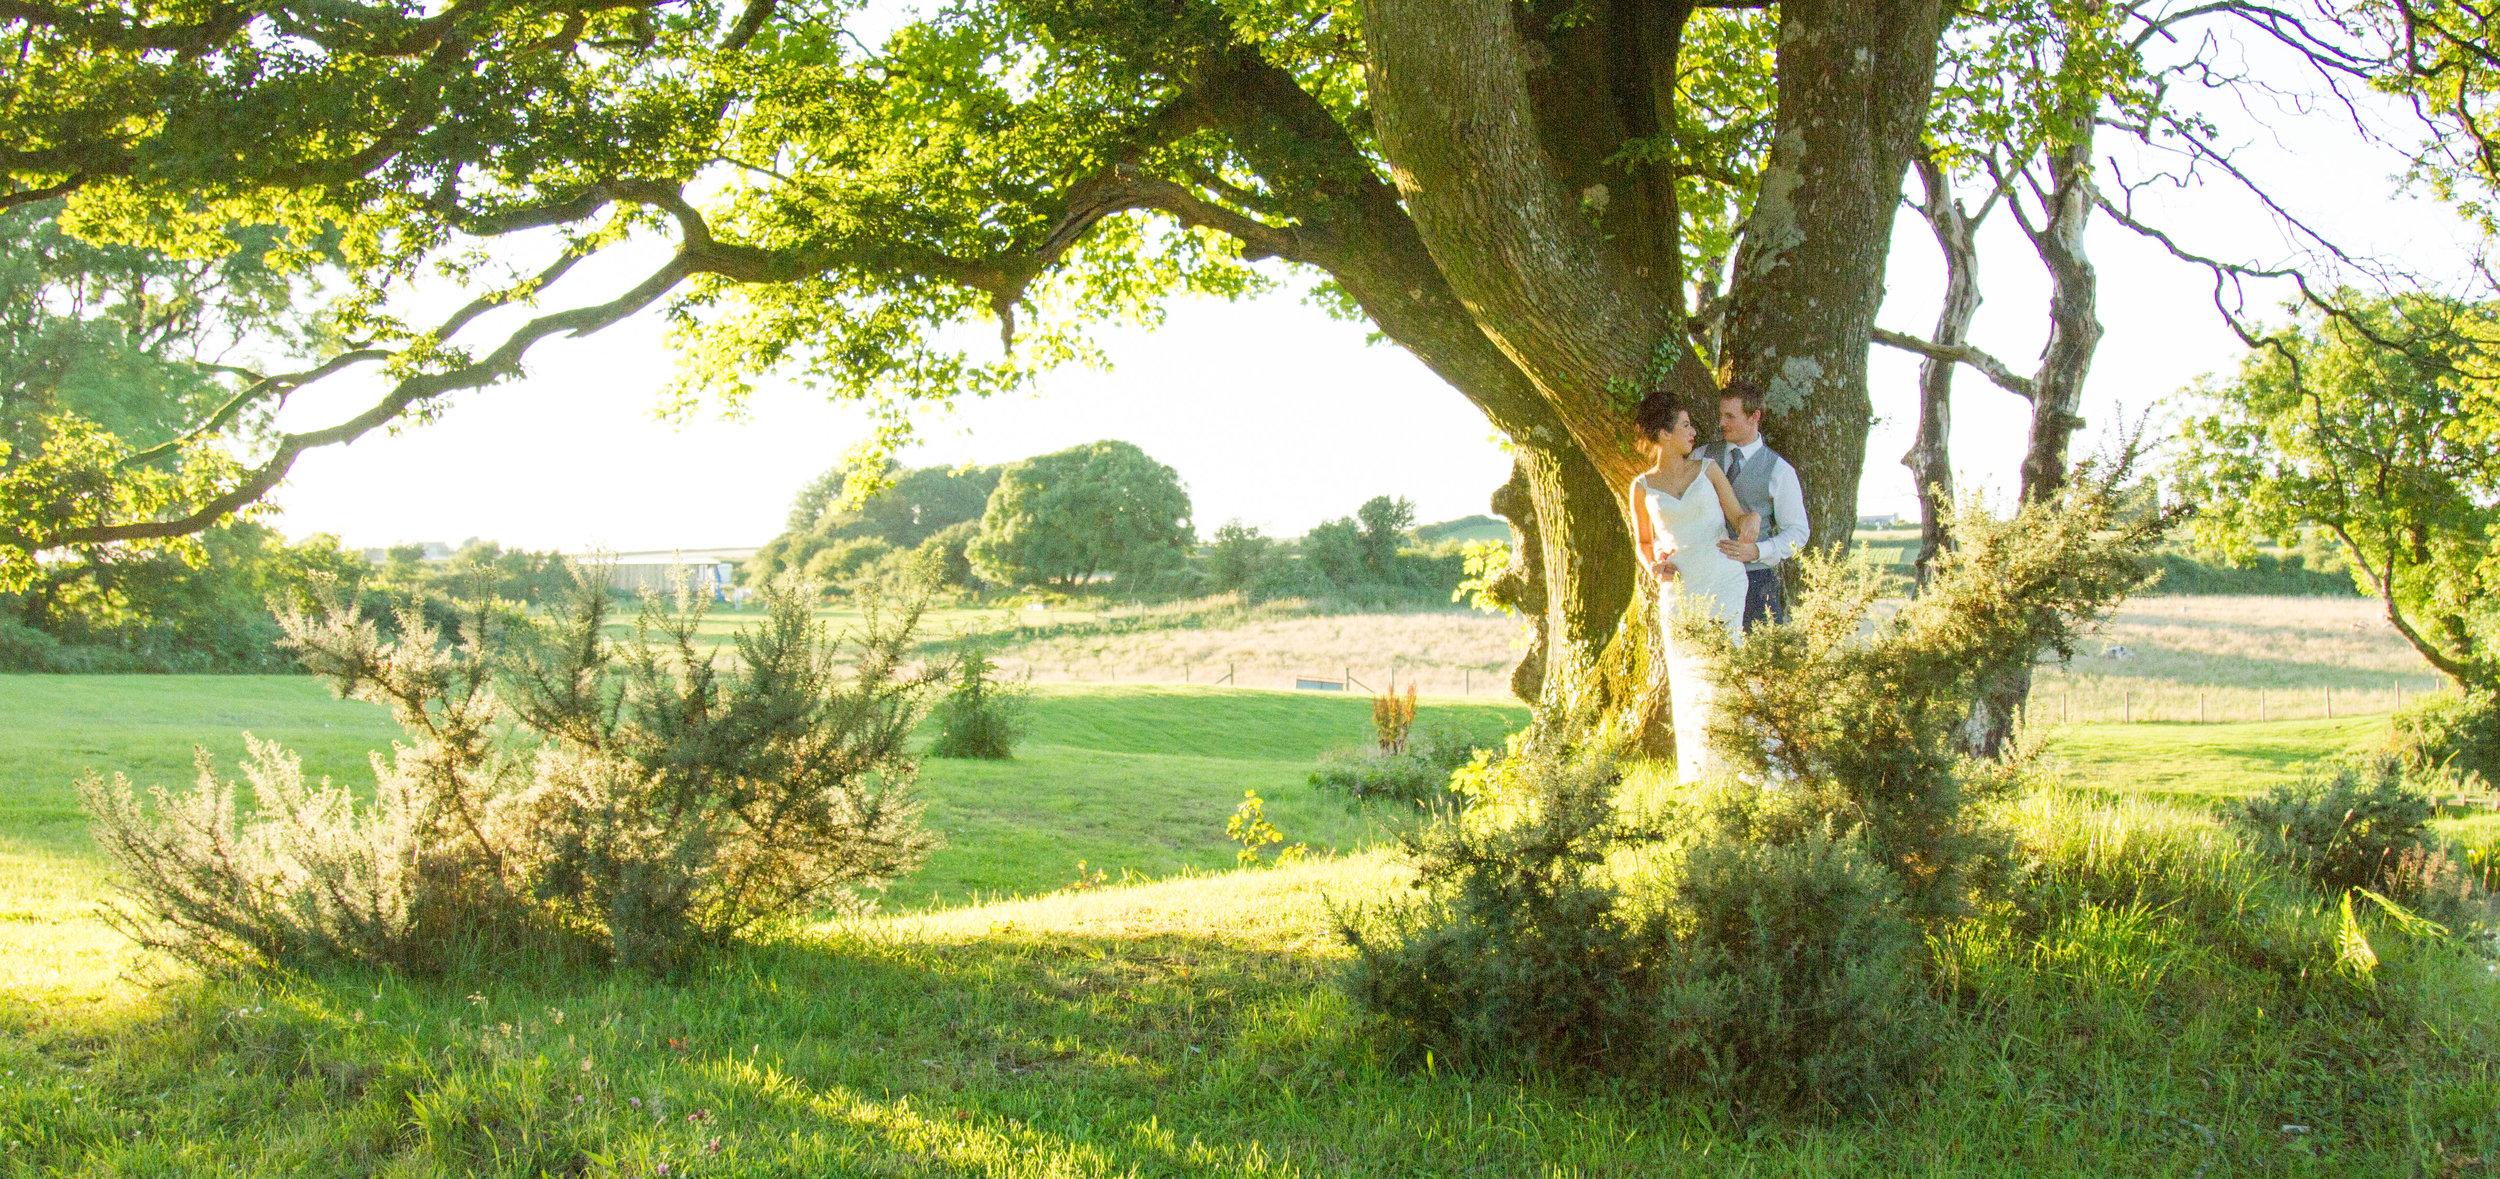 Cardiff wedding photographer, welsh wedding photographer, wedding photographer